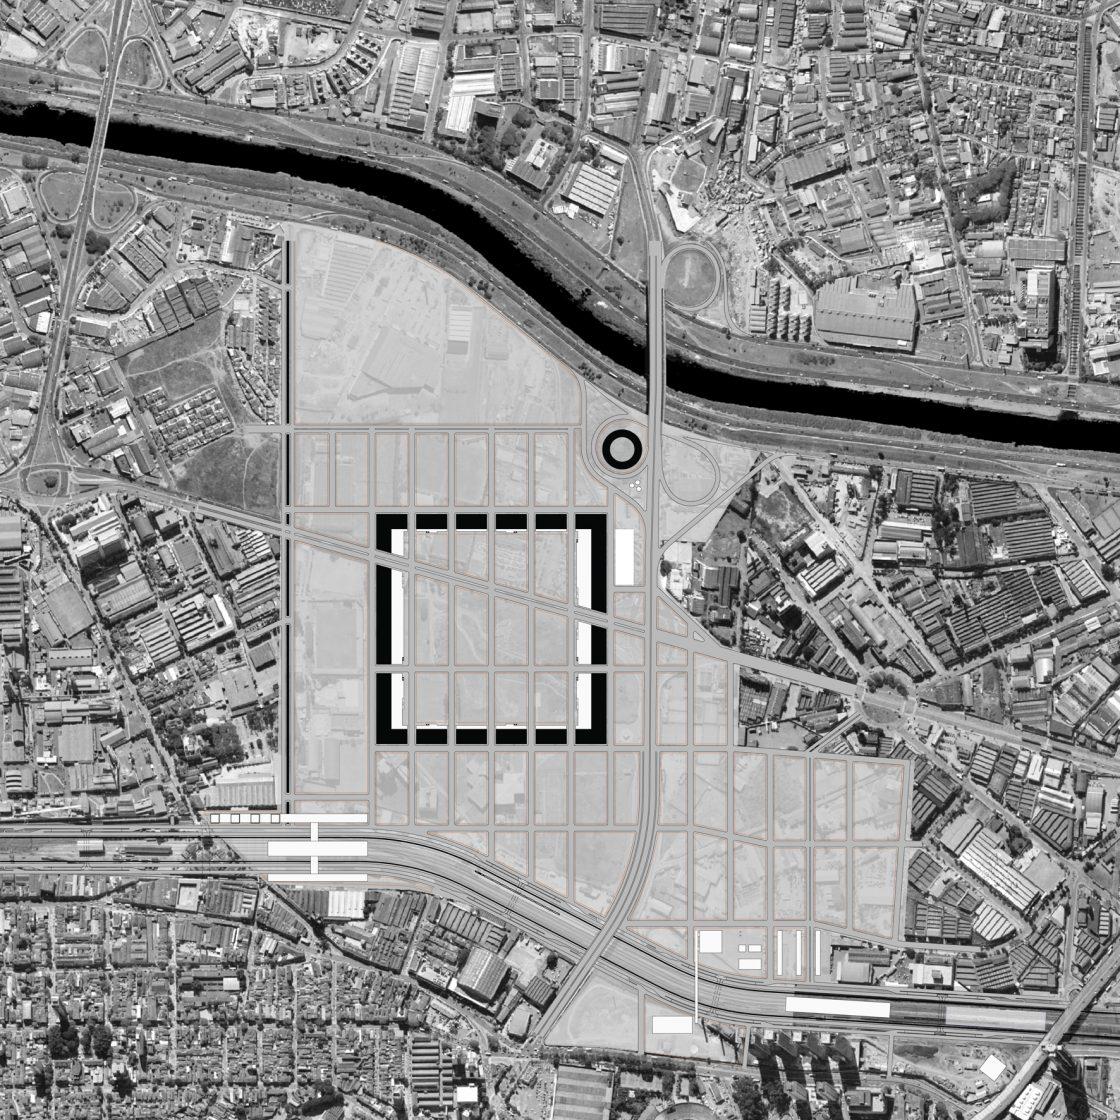 Bairro Novo Plano urbano